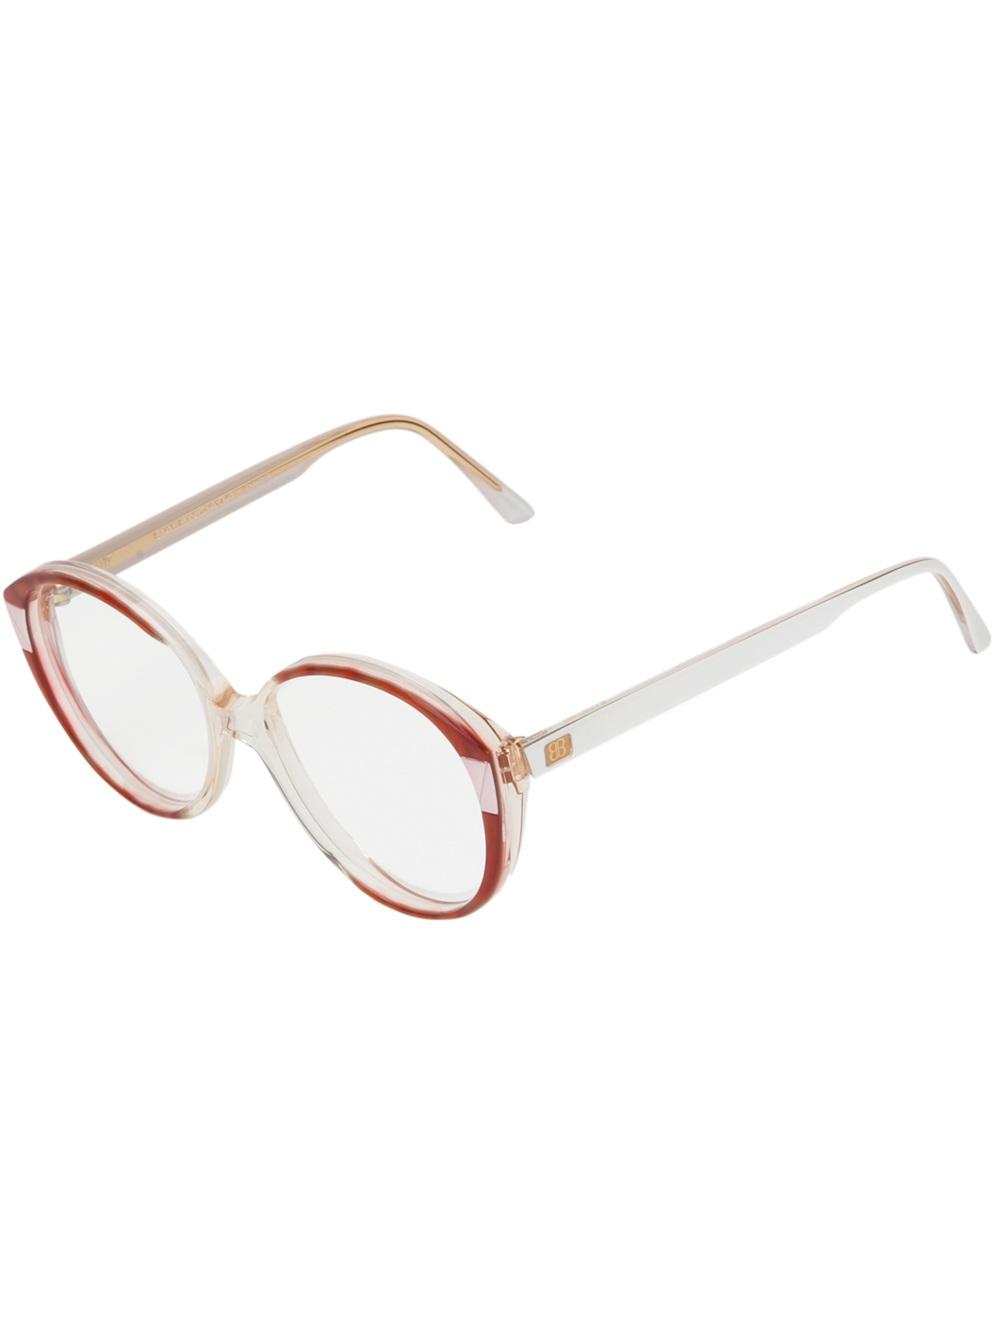 Balenciaga Vintage Oval Frame Glasses in Transparent Lyst